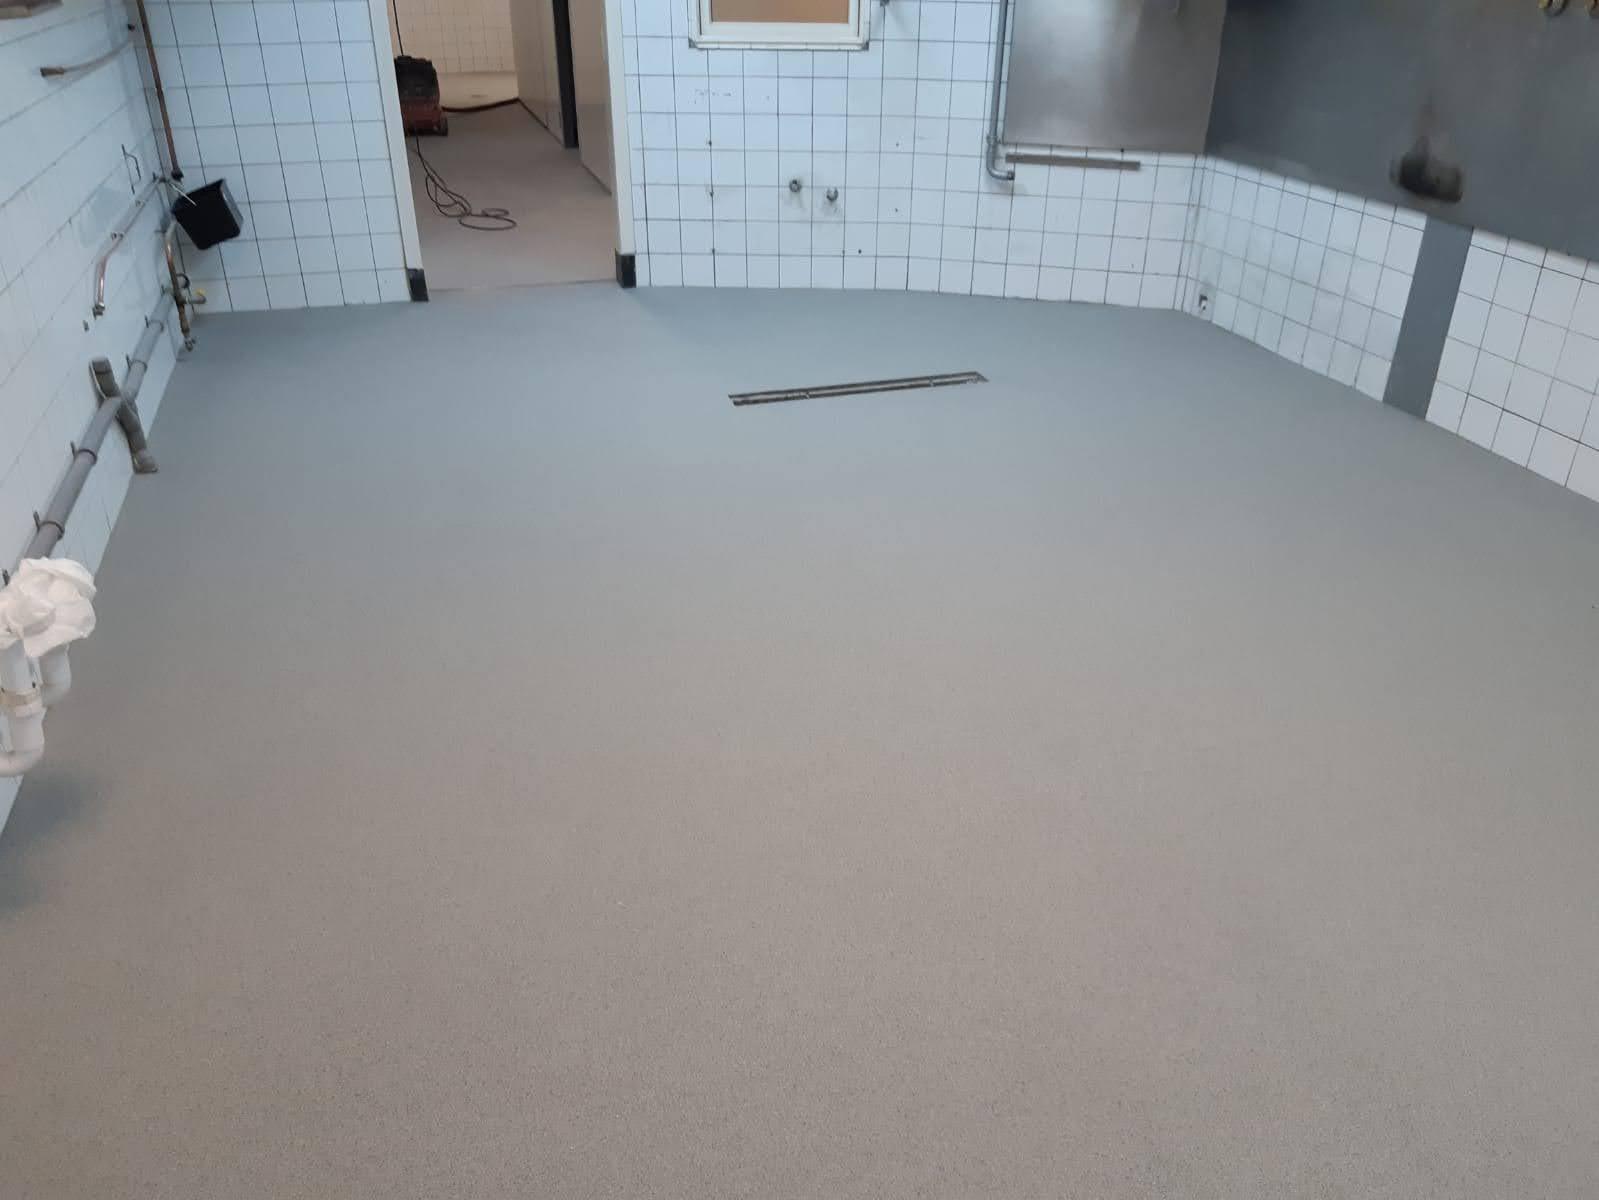 HACCP keukenvloer